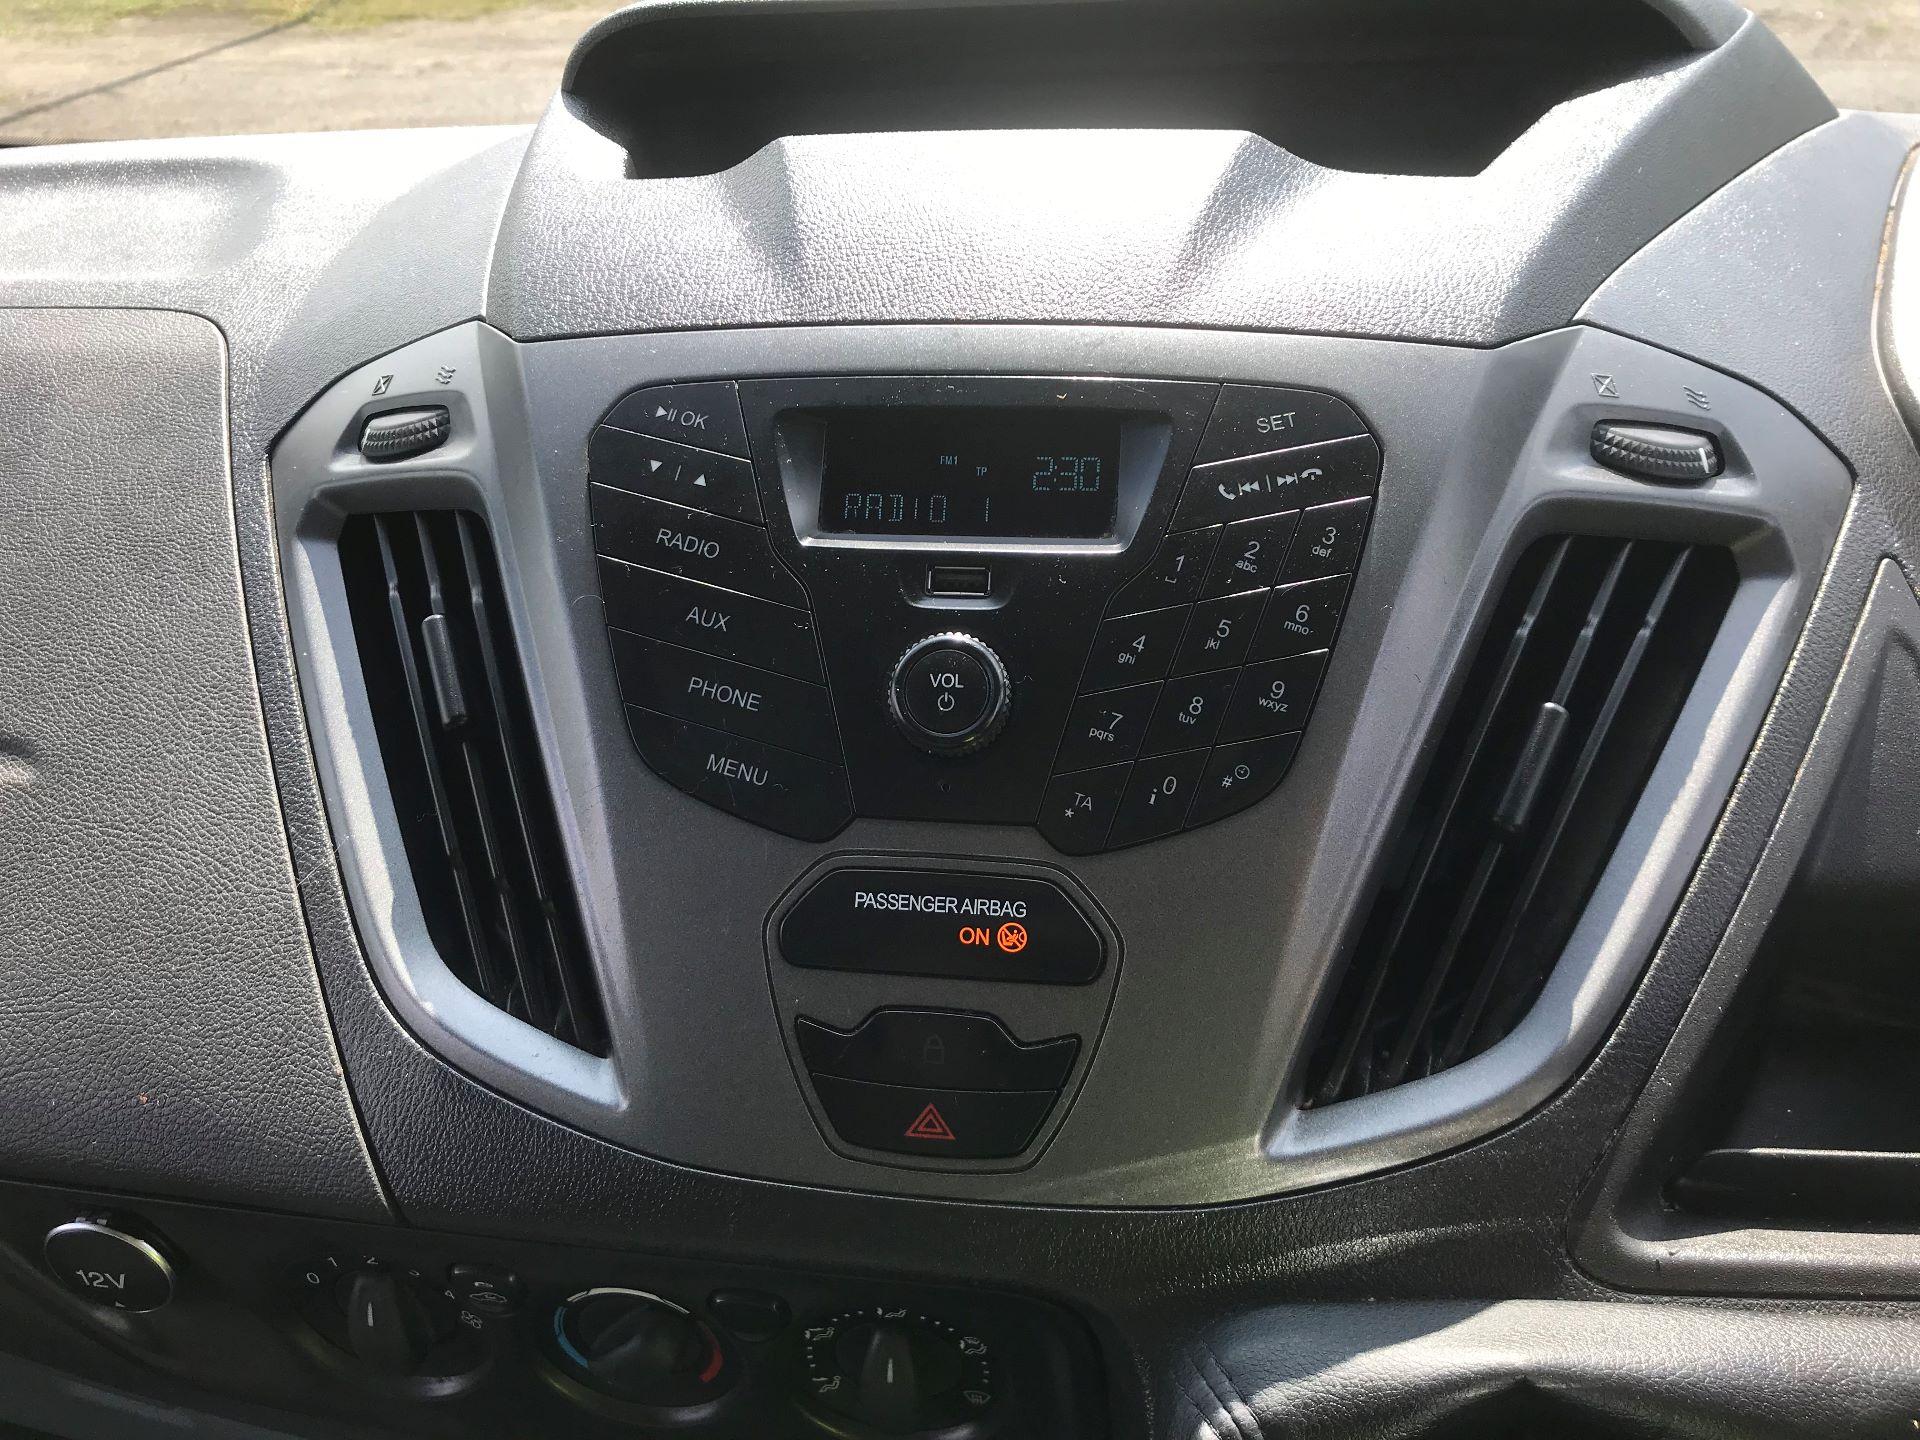 2014 Ford Transit Custom 310  L2 DIESEL FWD 2.2 TDCI 125PS LOW ROOF KOMBI VAN EURO 5 VAT INC (ND14OCH) Image 16